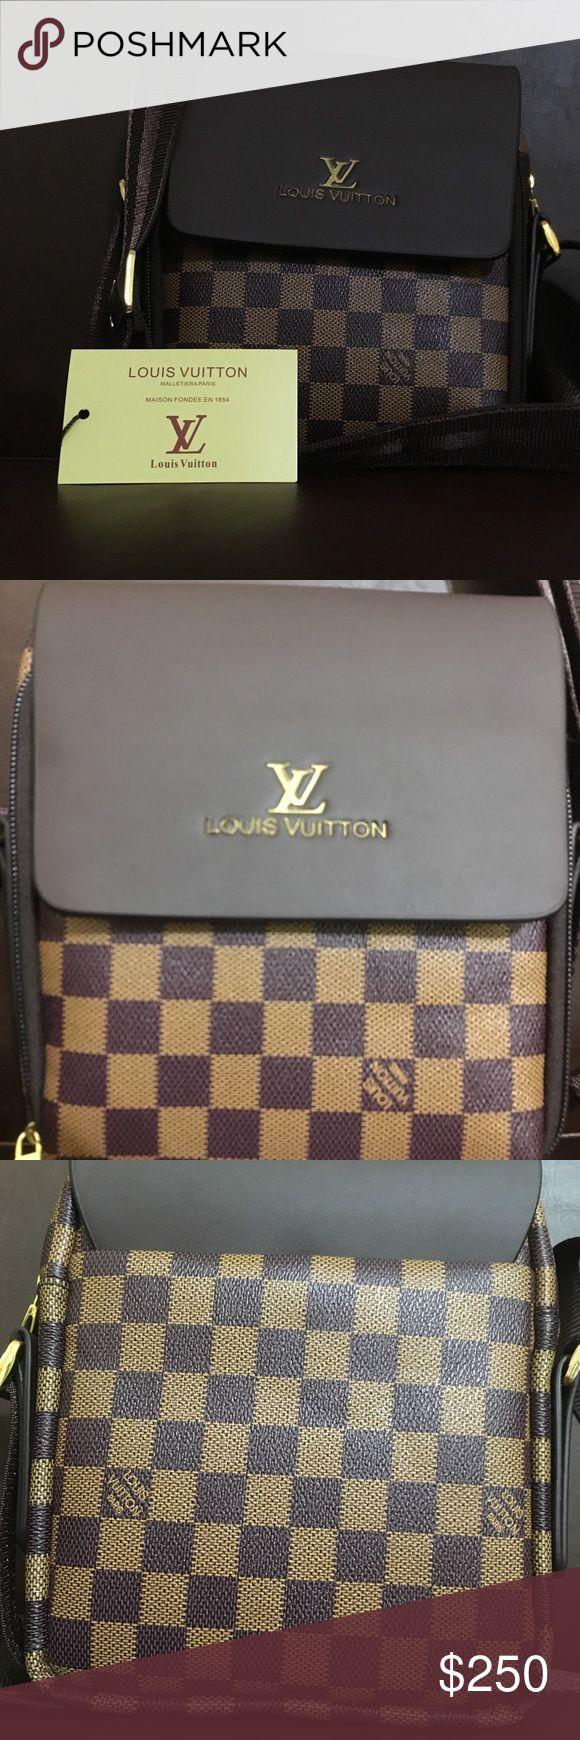 Louis vuitton messenger bag OPEN FOR OFFERS Small brown shoulder bag (unisex) Louis Vuitton Bags Messenger Bags